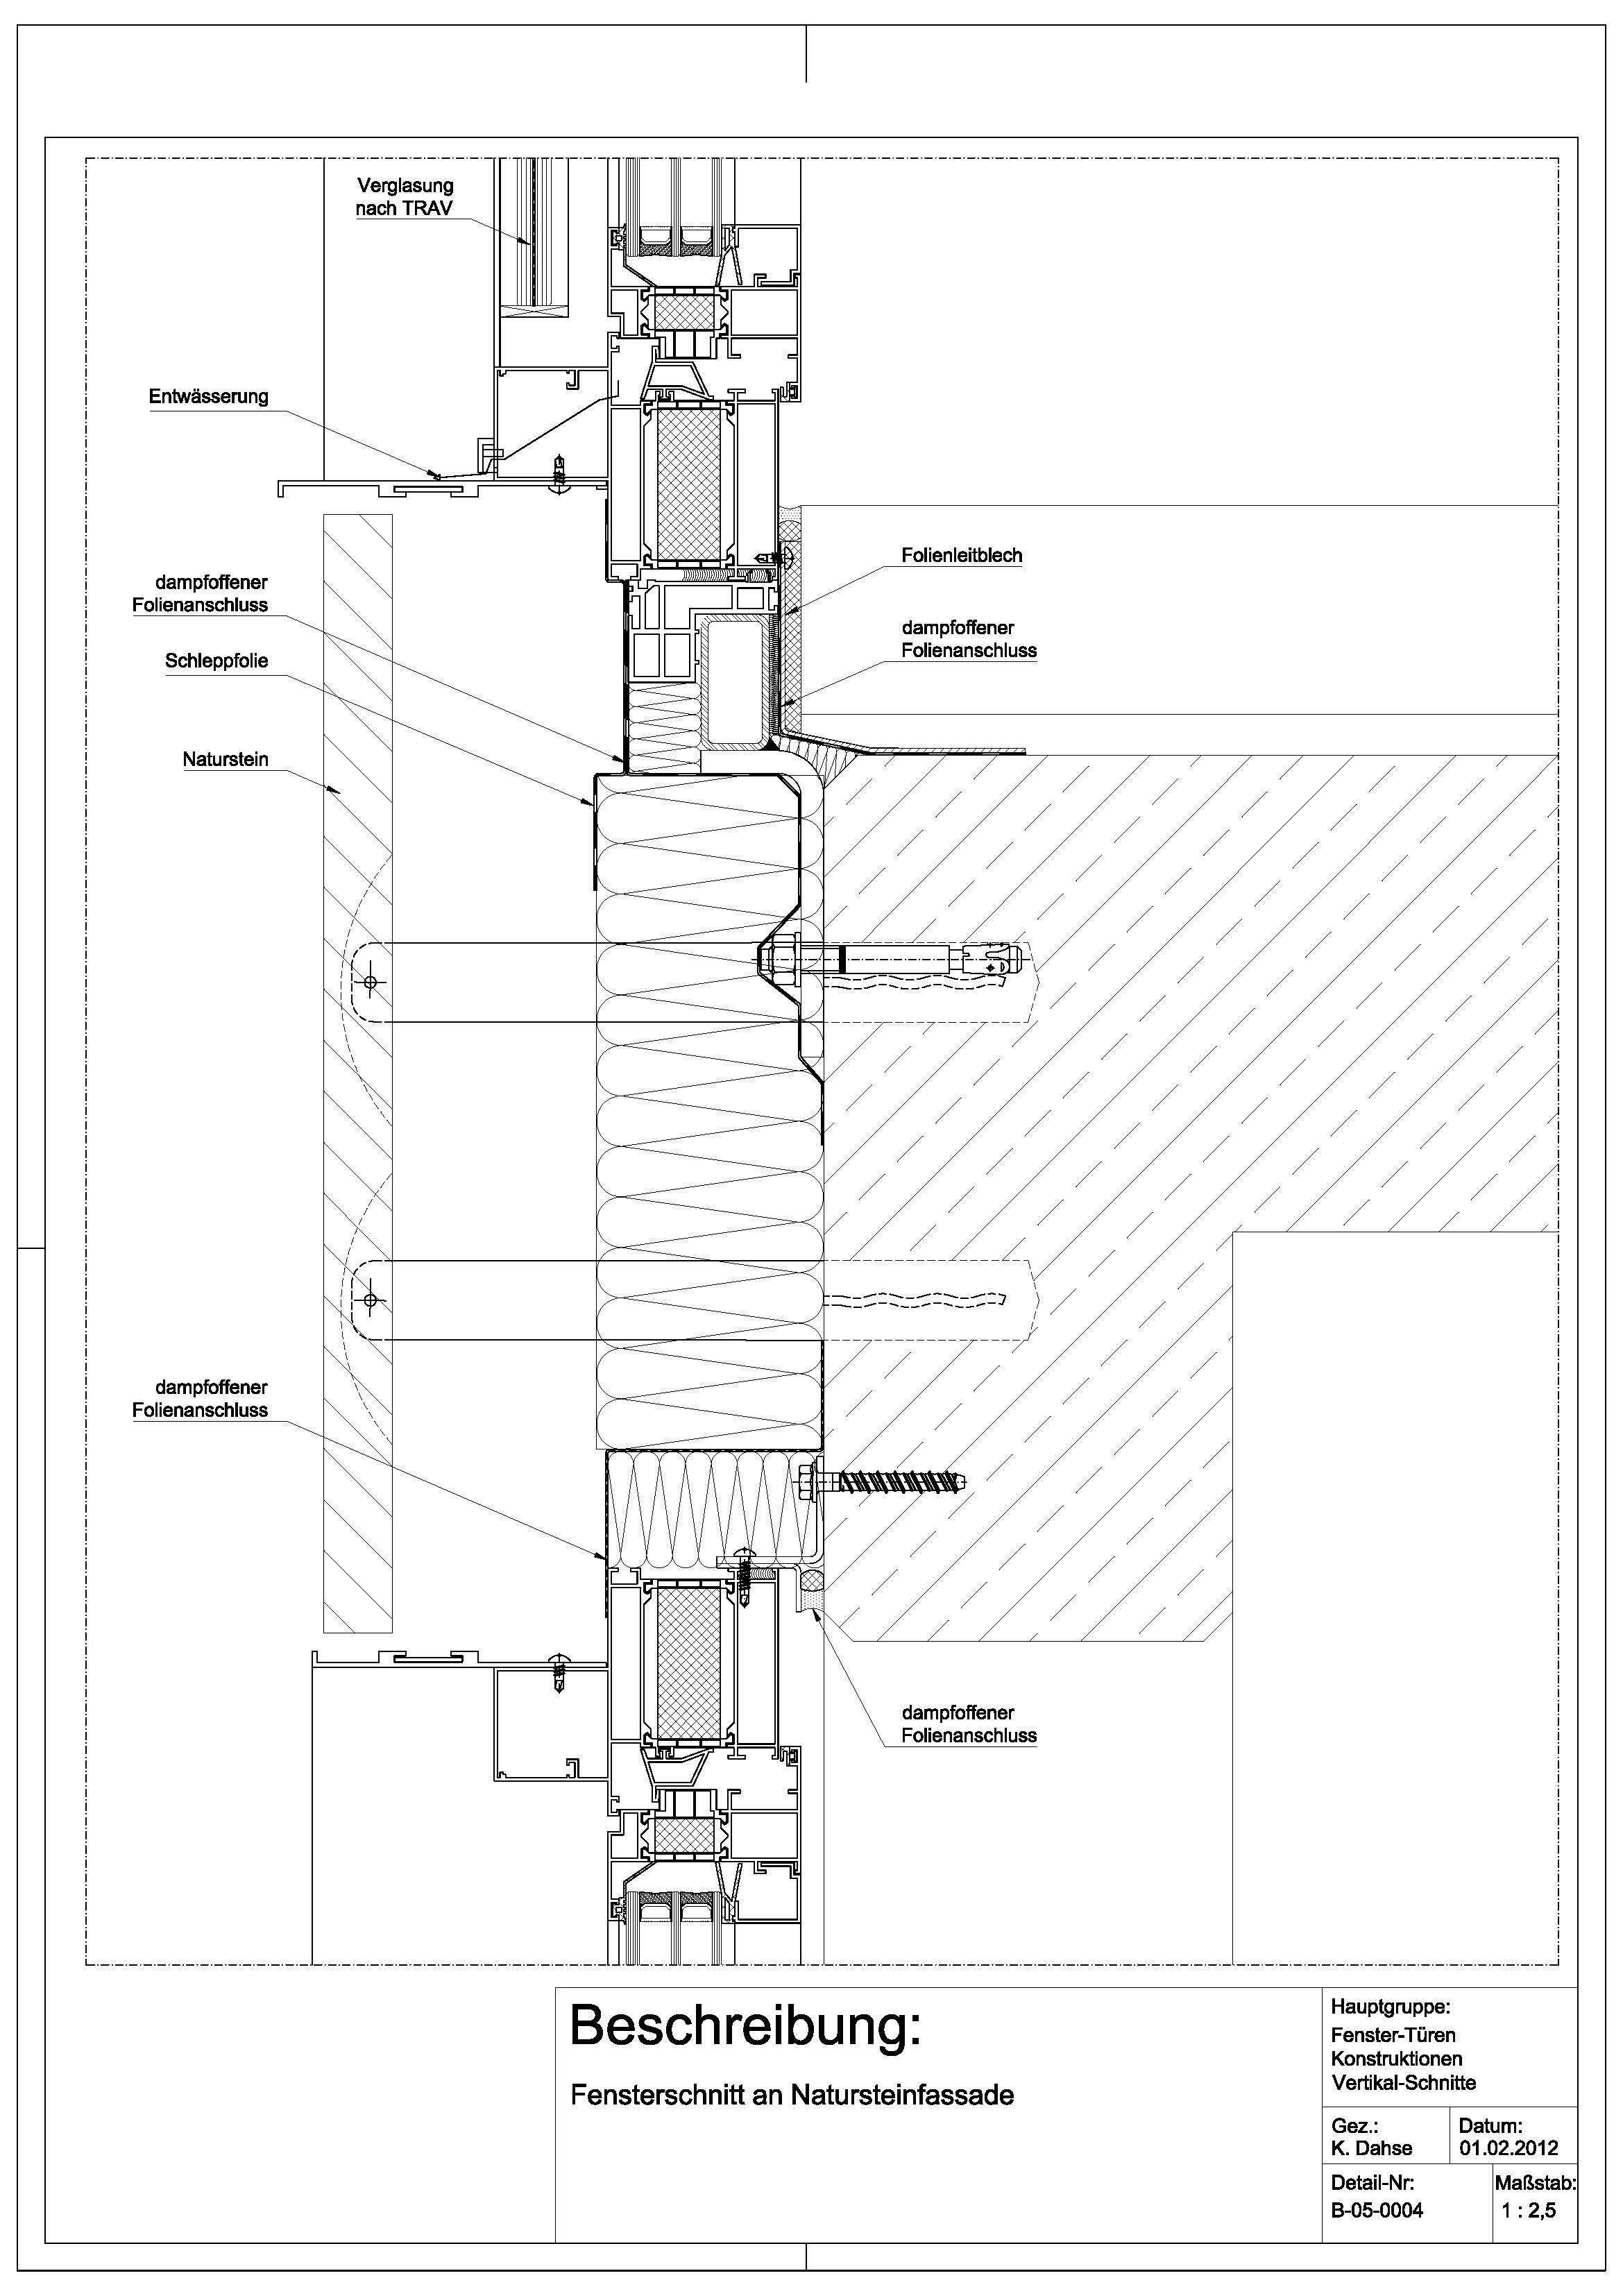 B 05 0004 fensterschnitt an natursteinfassade detail for Fenster detail schnitt